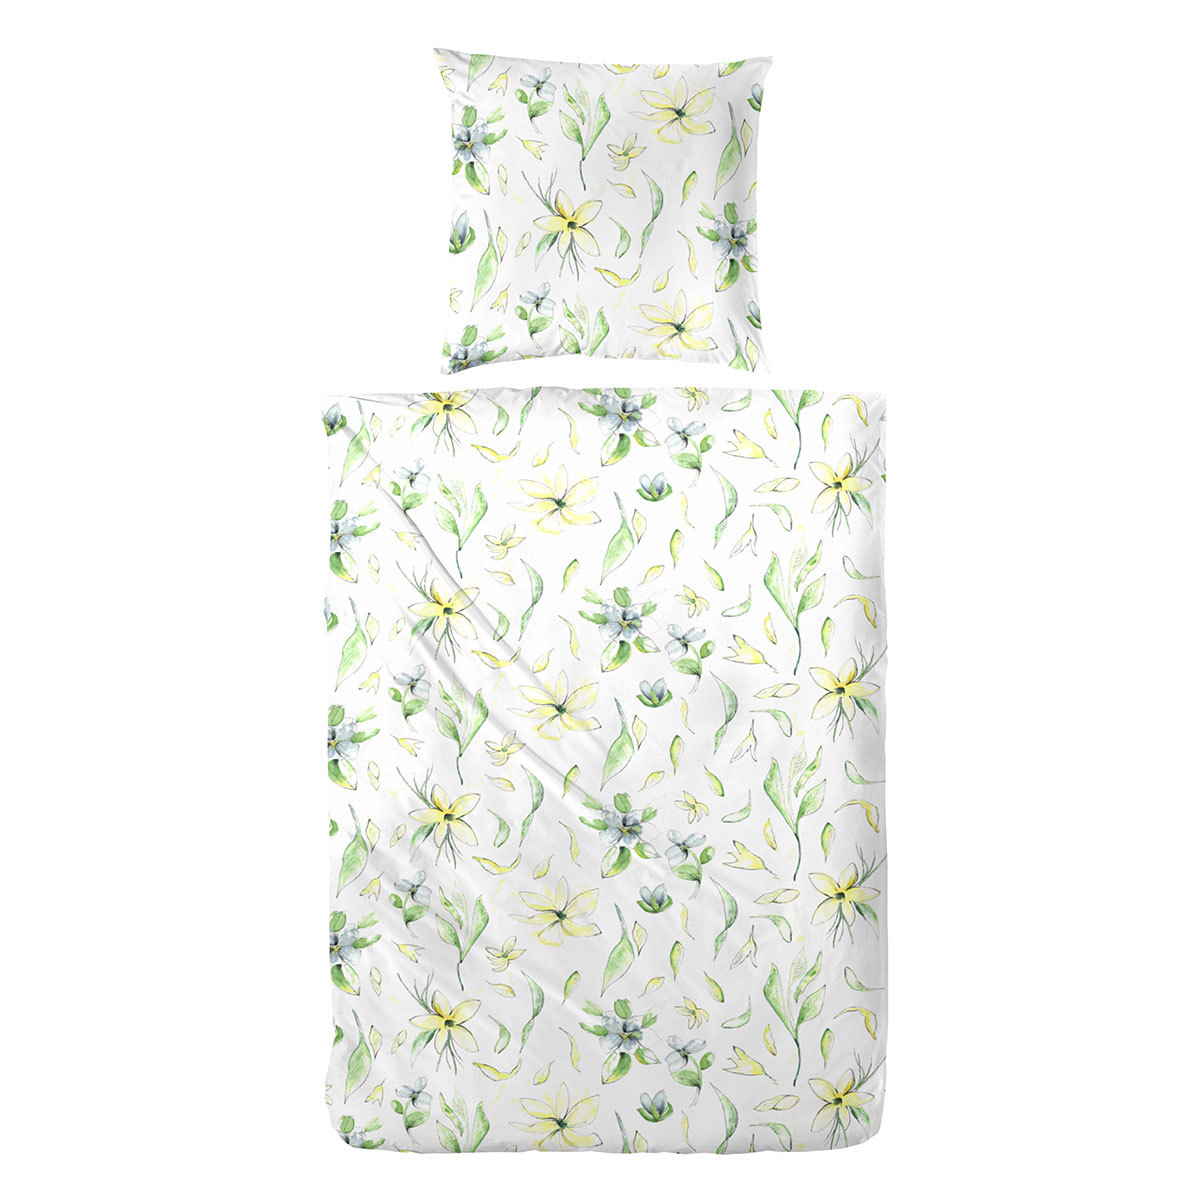 enrico coss baumwoll seersucker bettw sche flowers gr n. Black Bedroom Furniture Sets. Home Design Ideas